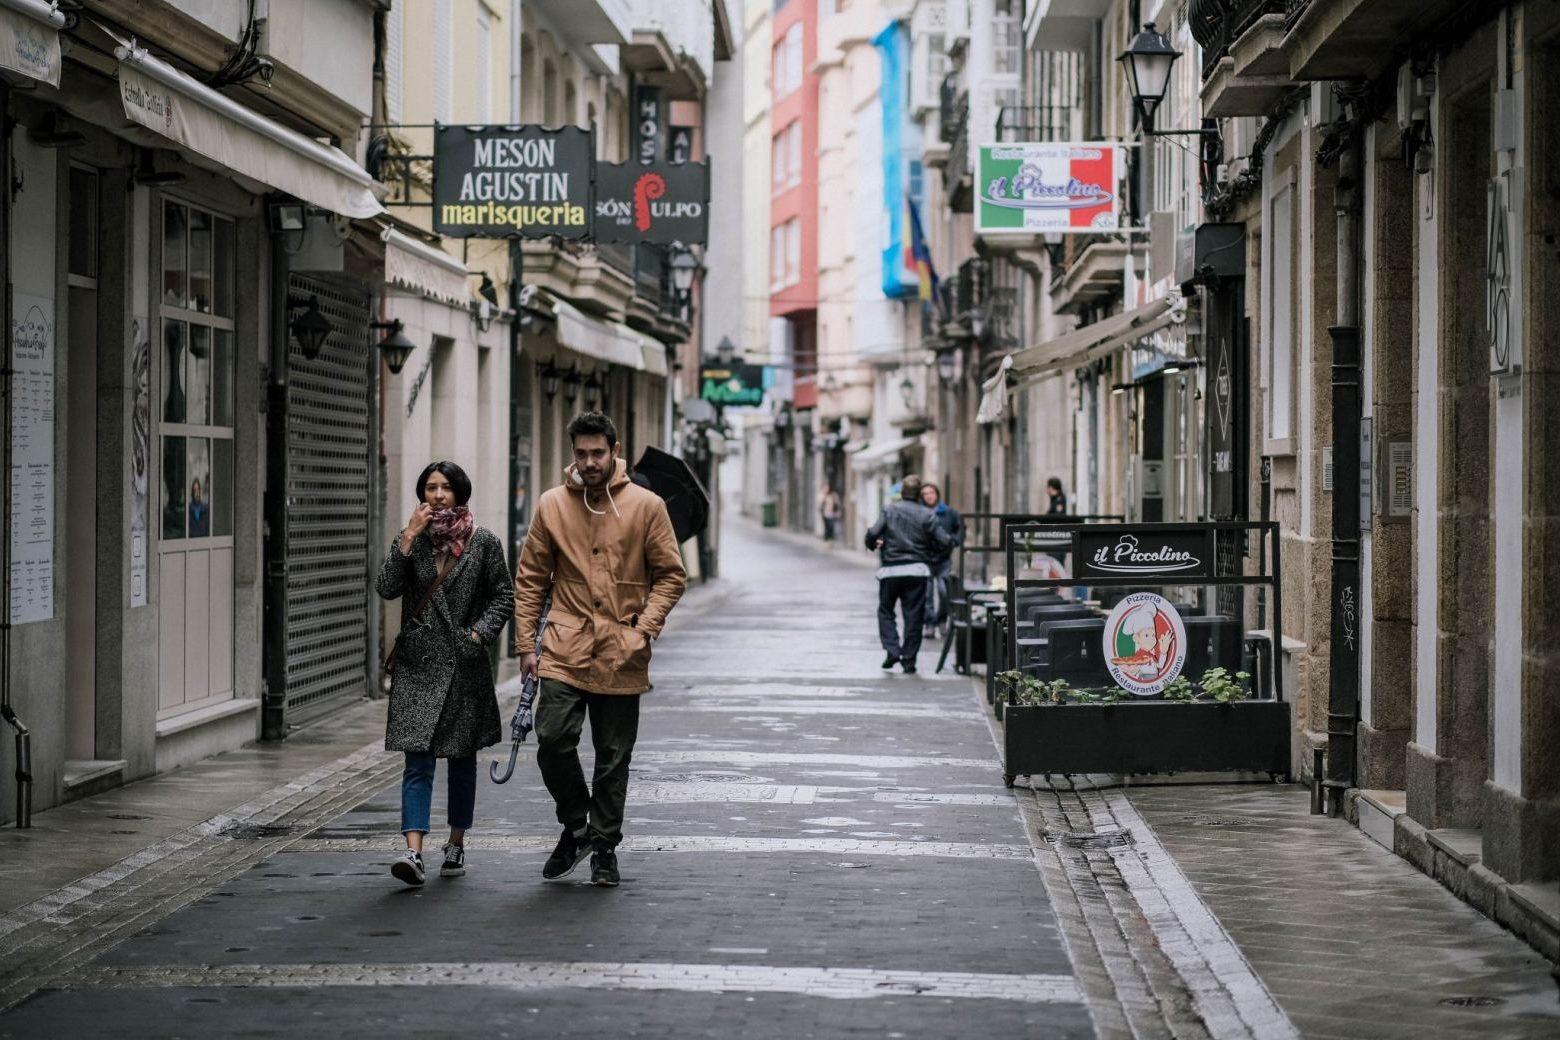 La-coruna-streets-spain